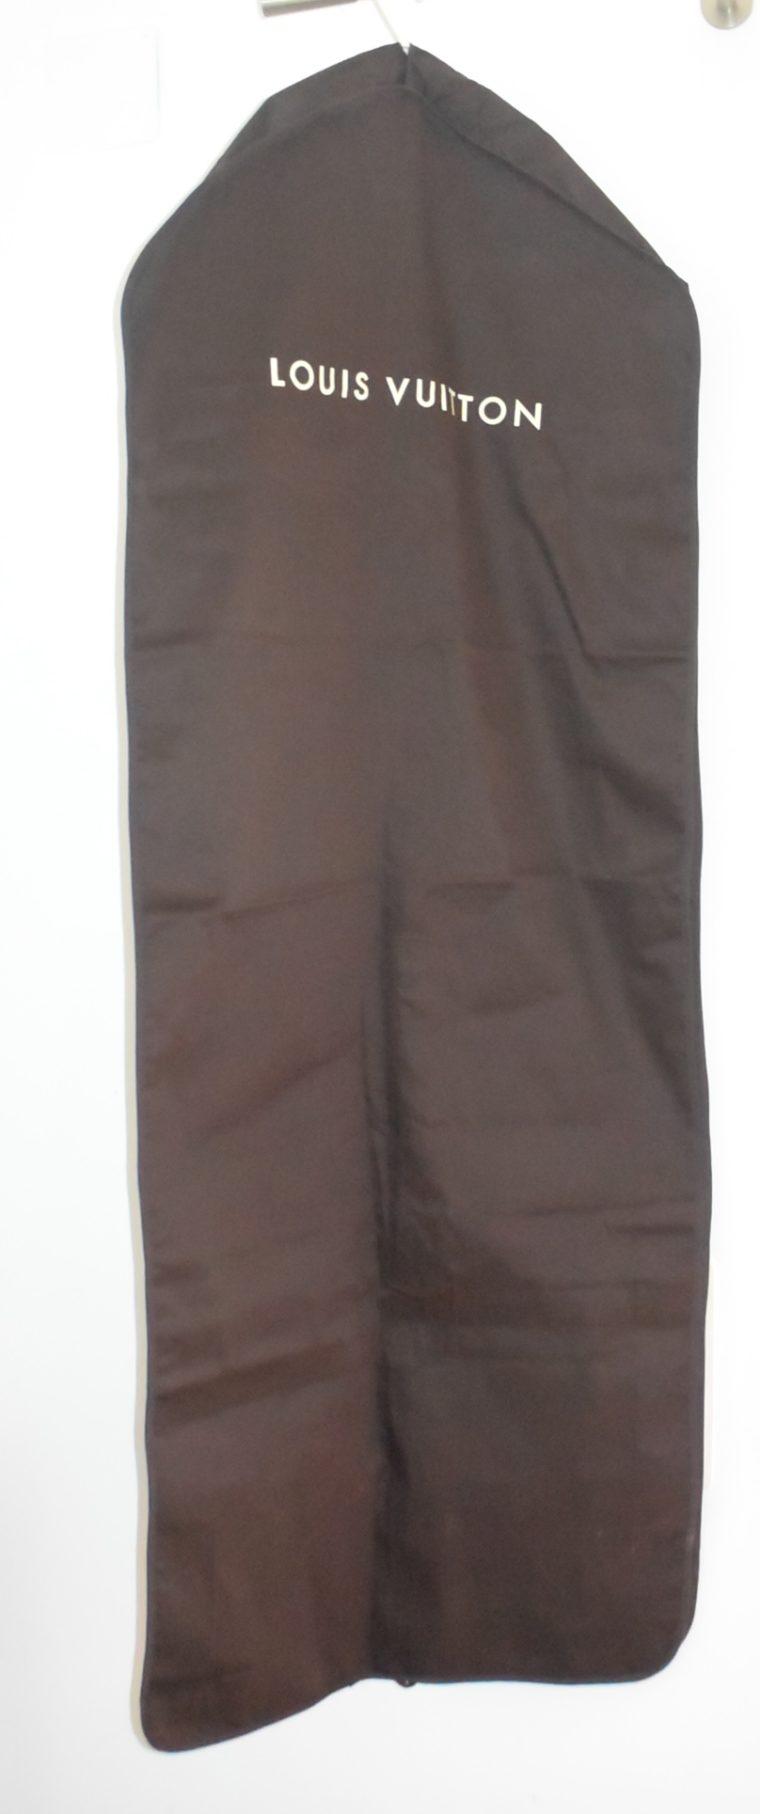 Louis Vuitton Kleidersack Kleiderhülle braun Stoff lang-0